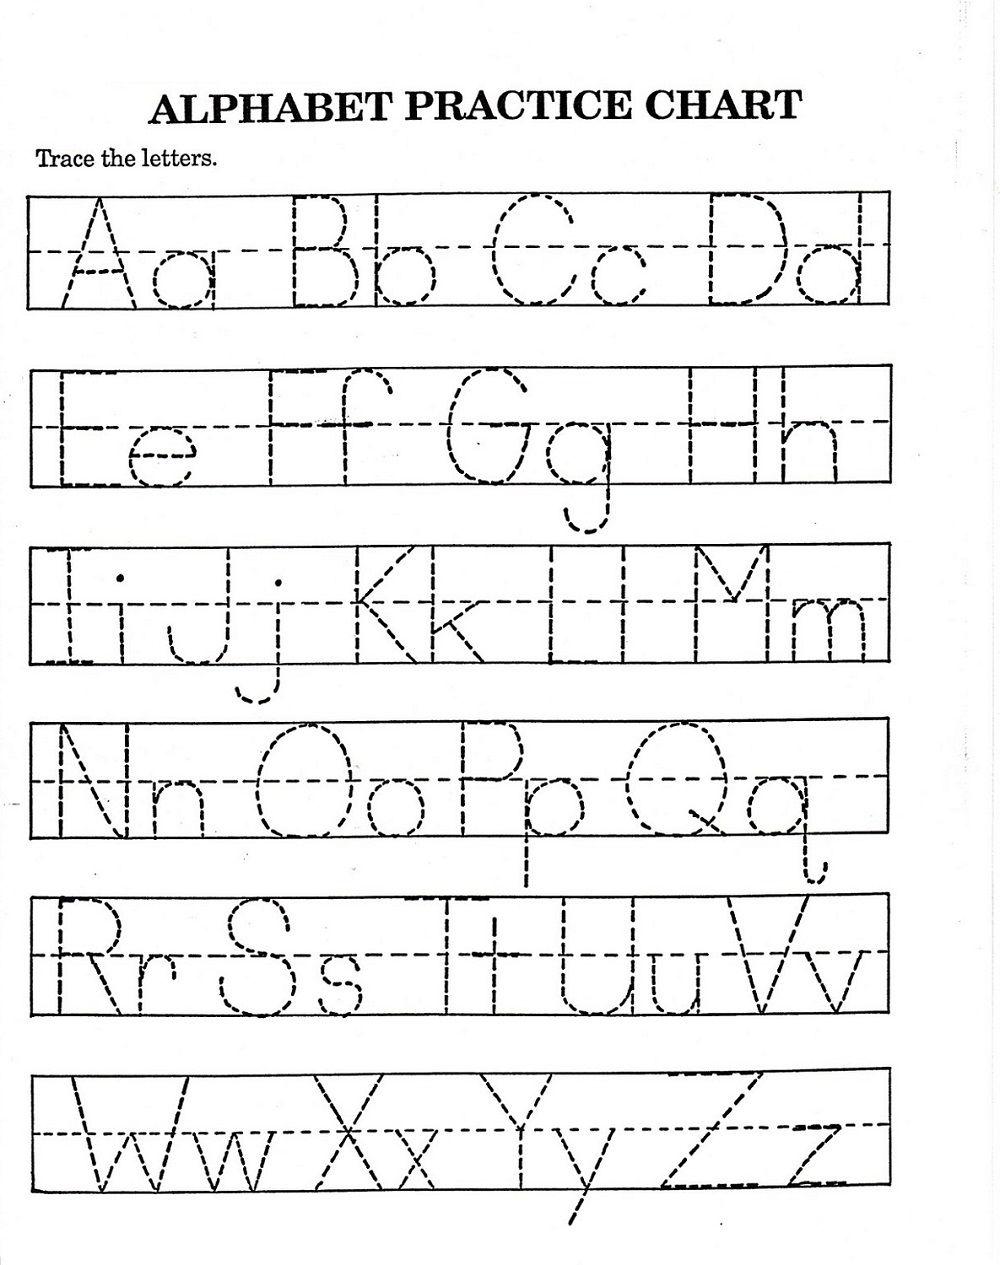 Traceable Alphabet Worksheets A-Z | Printable Alphabet